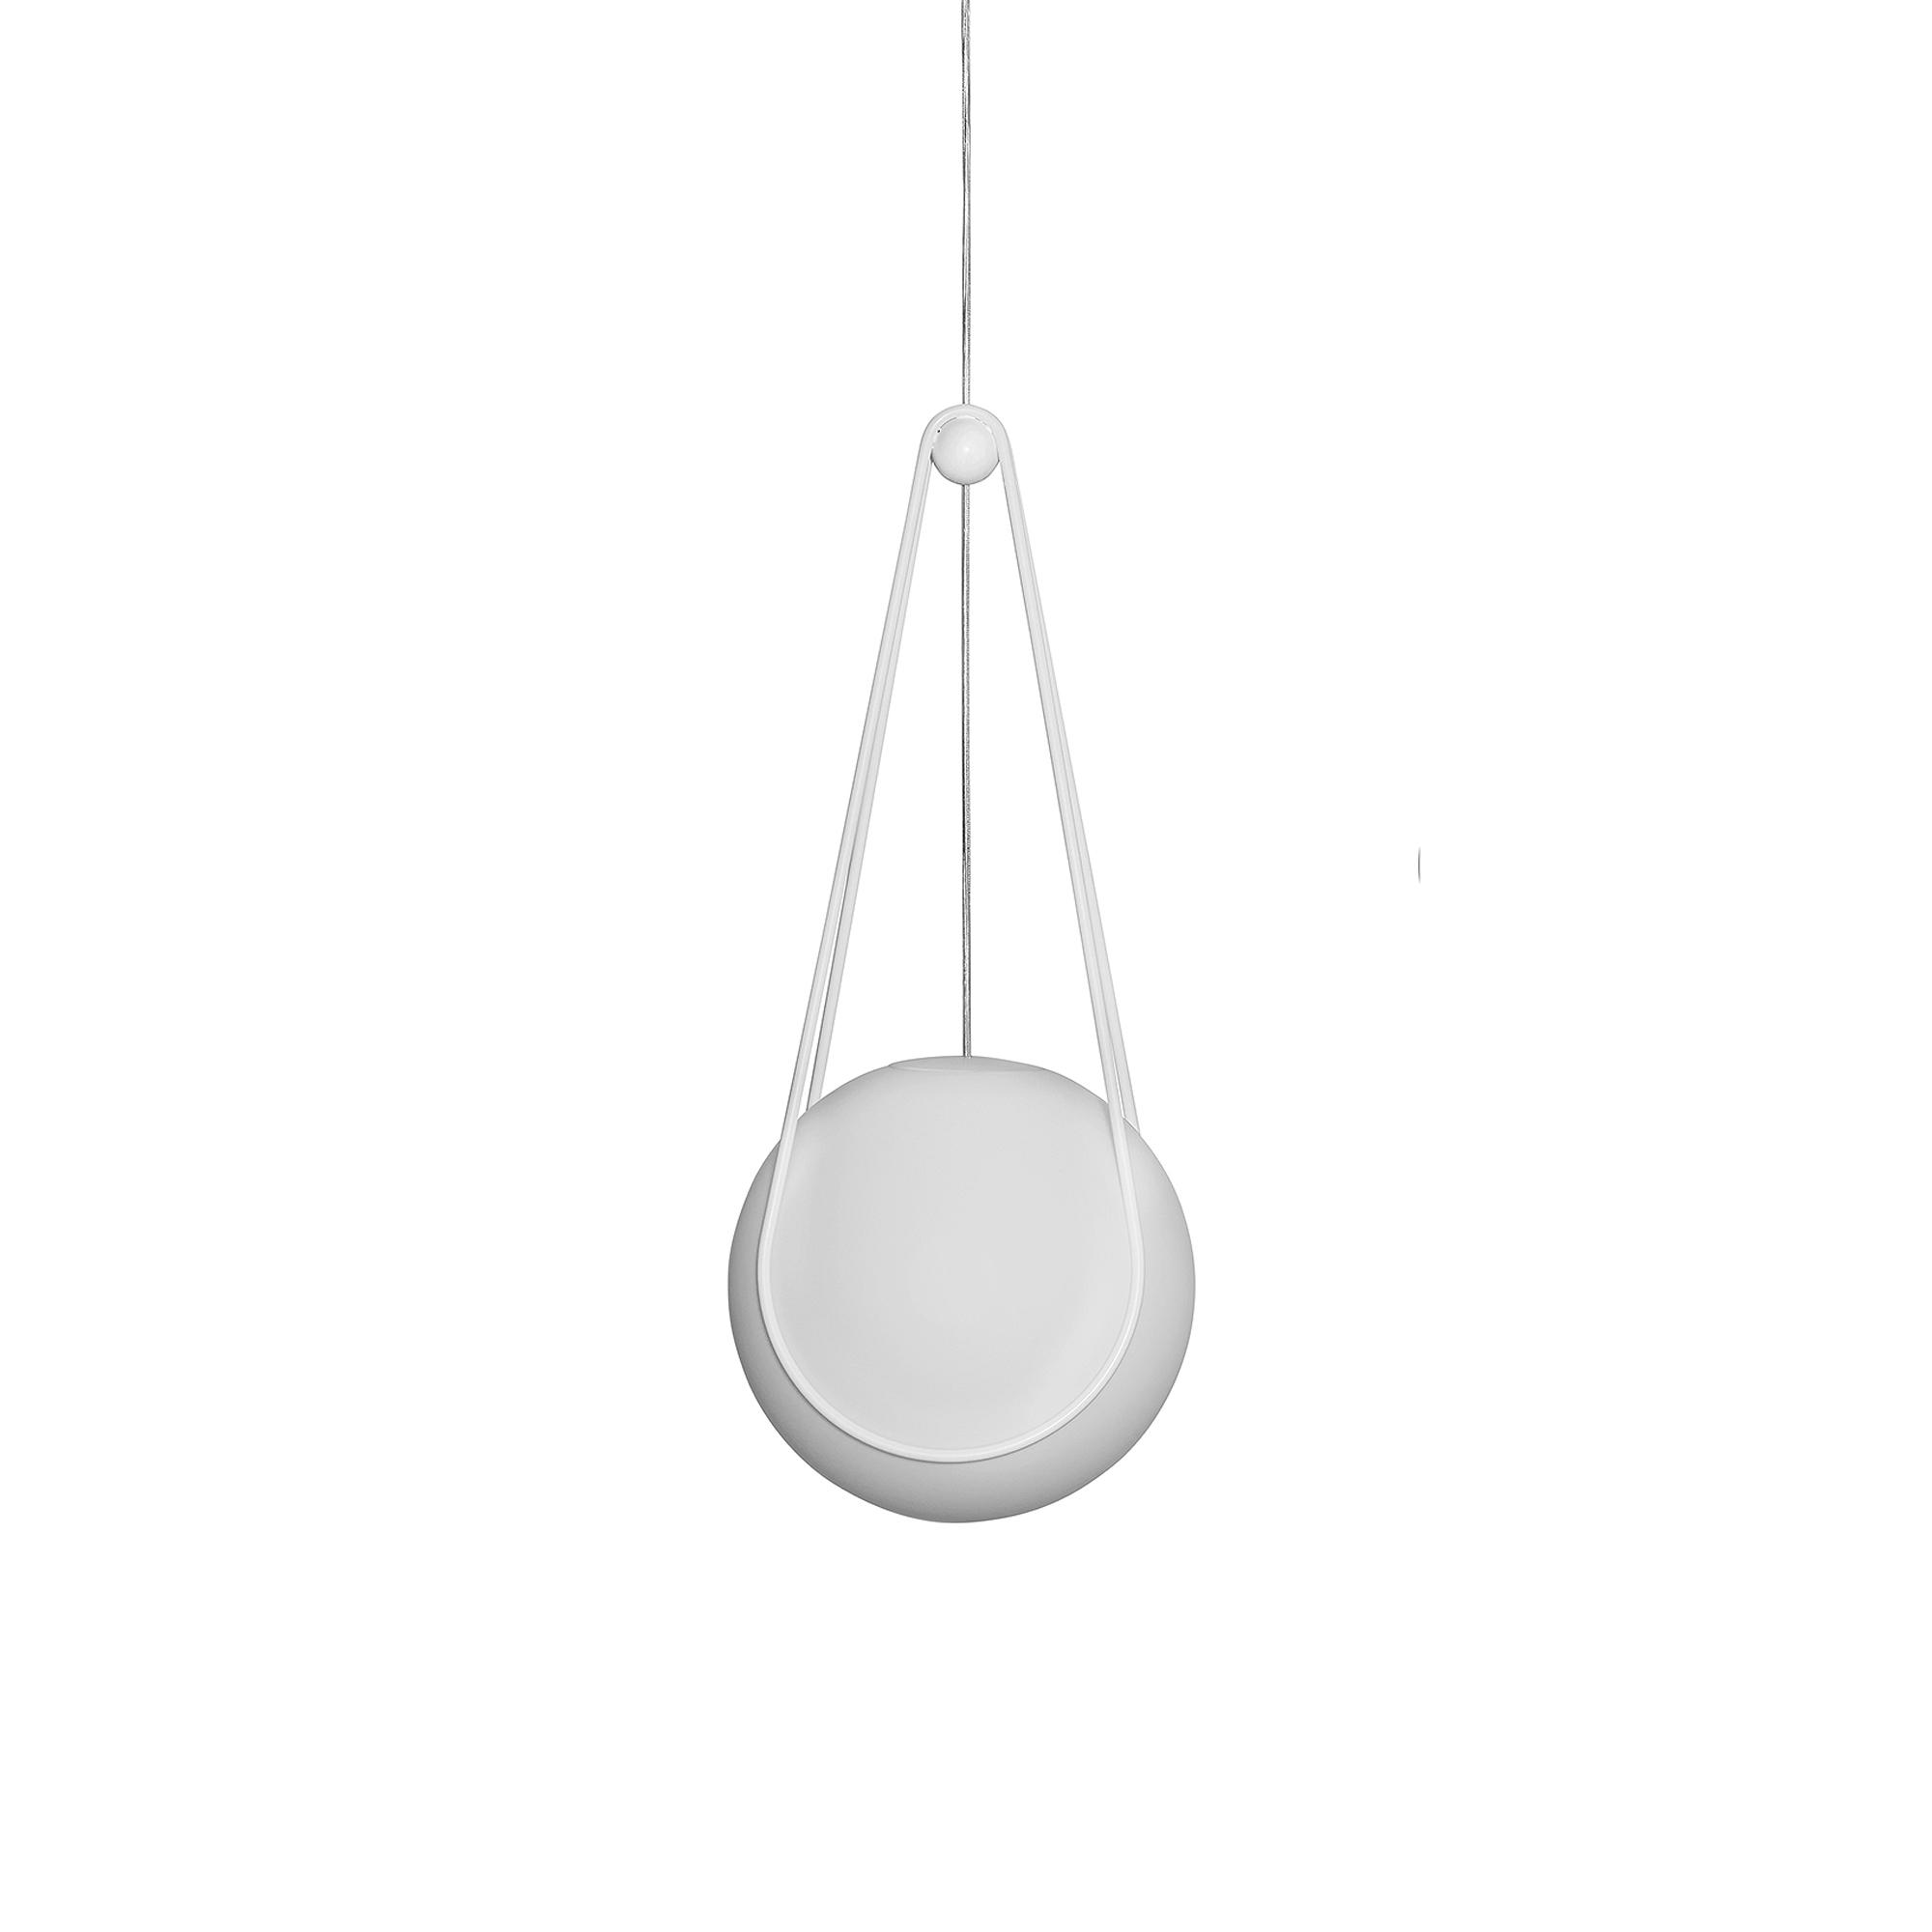 Design House Stockholm Lamphållare Kosmos 300mm vit